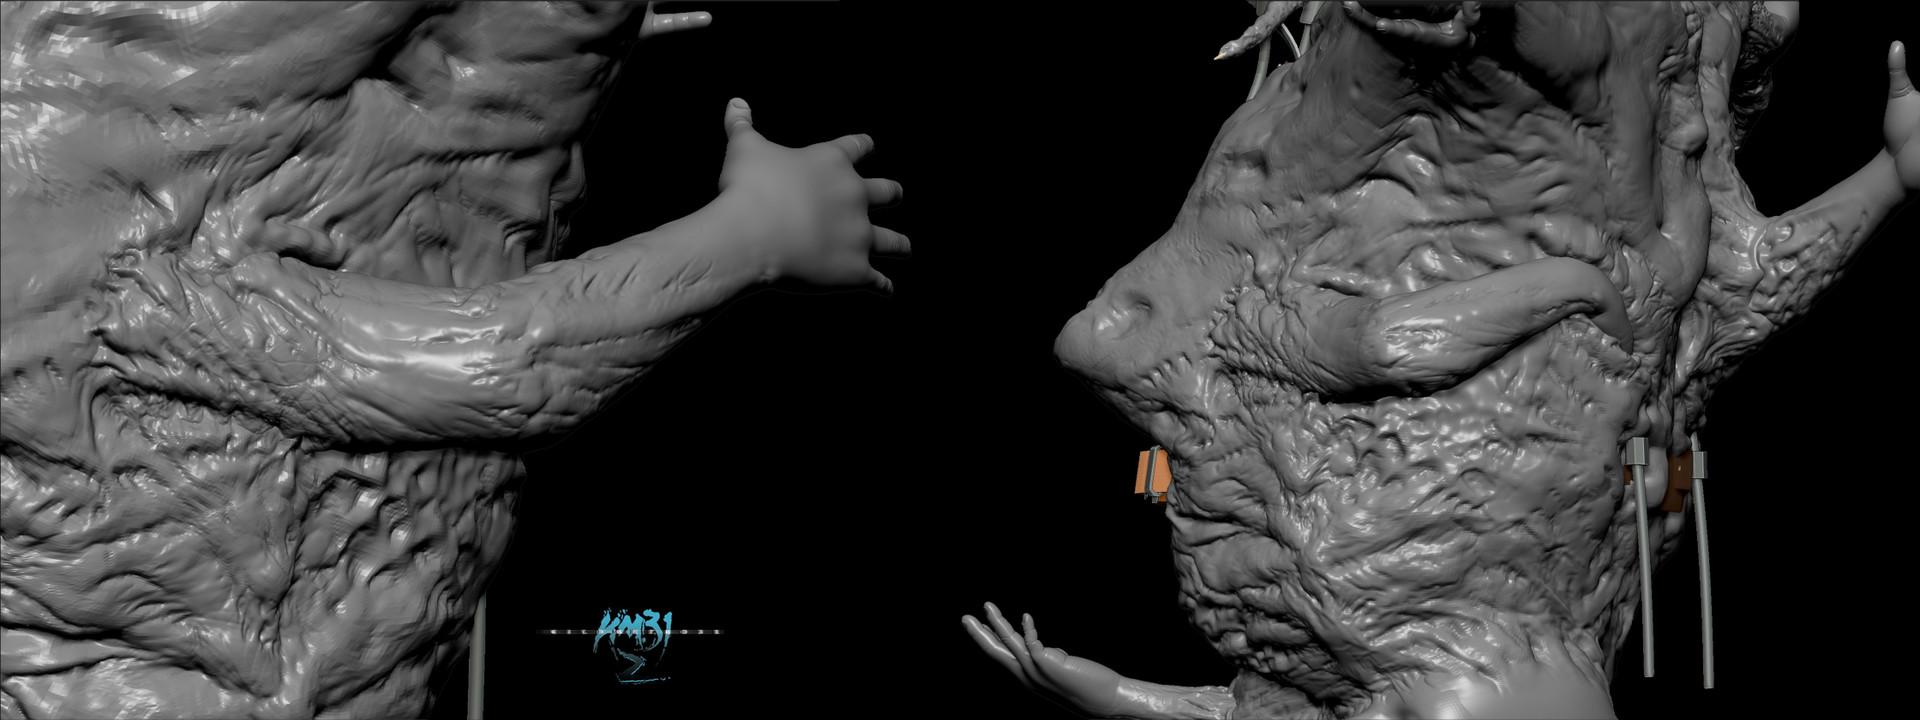 Raul eduardo sanchez osorio km312 agatha sculpt turnaorund phase 3 final sculpt arm position and detail